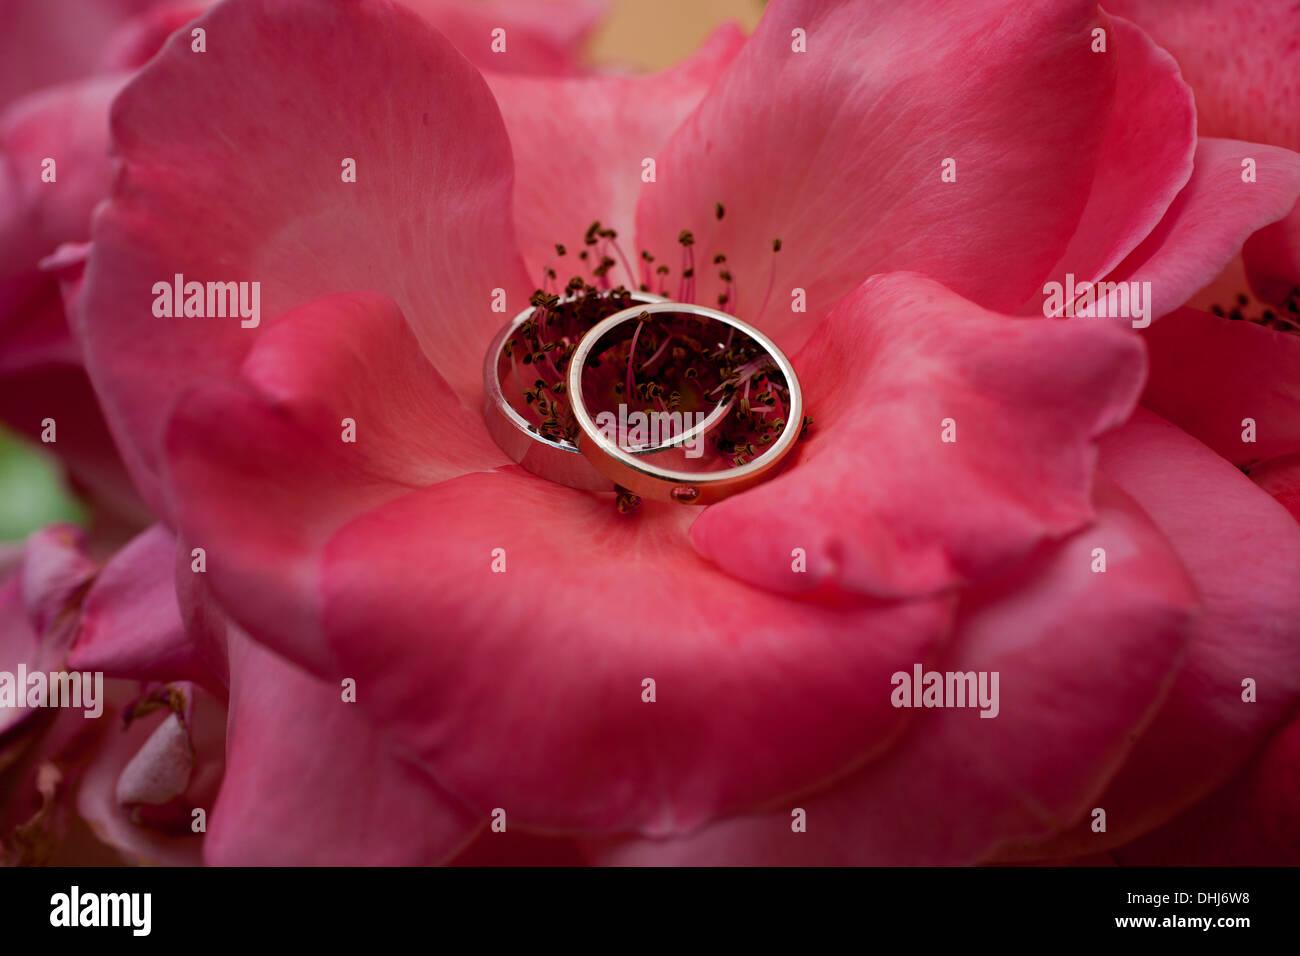 Wedding Rings Flower Leaf Texture Stock Photos & Wedding Rings ...